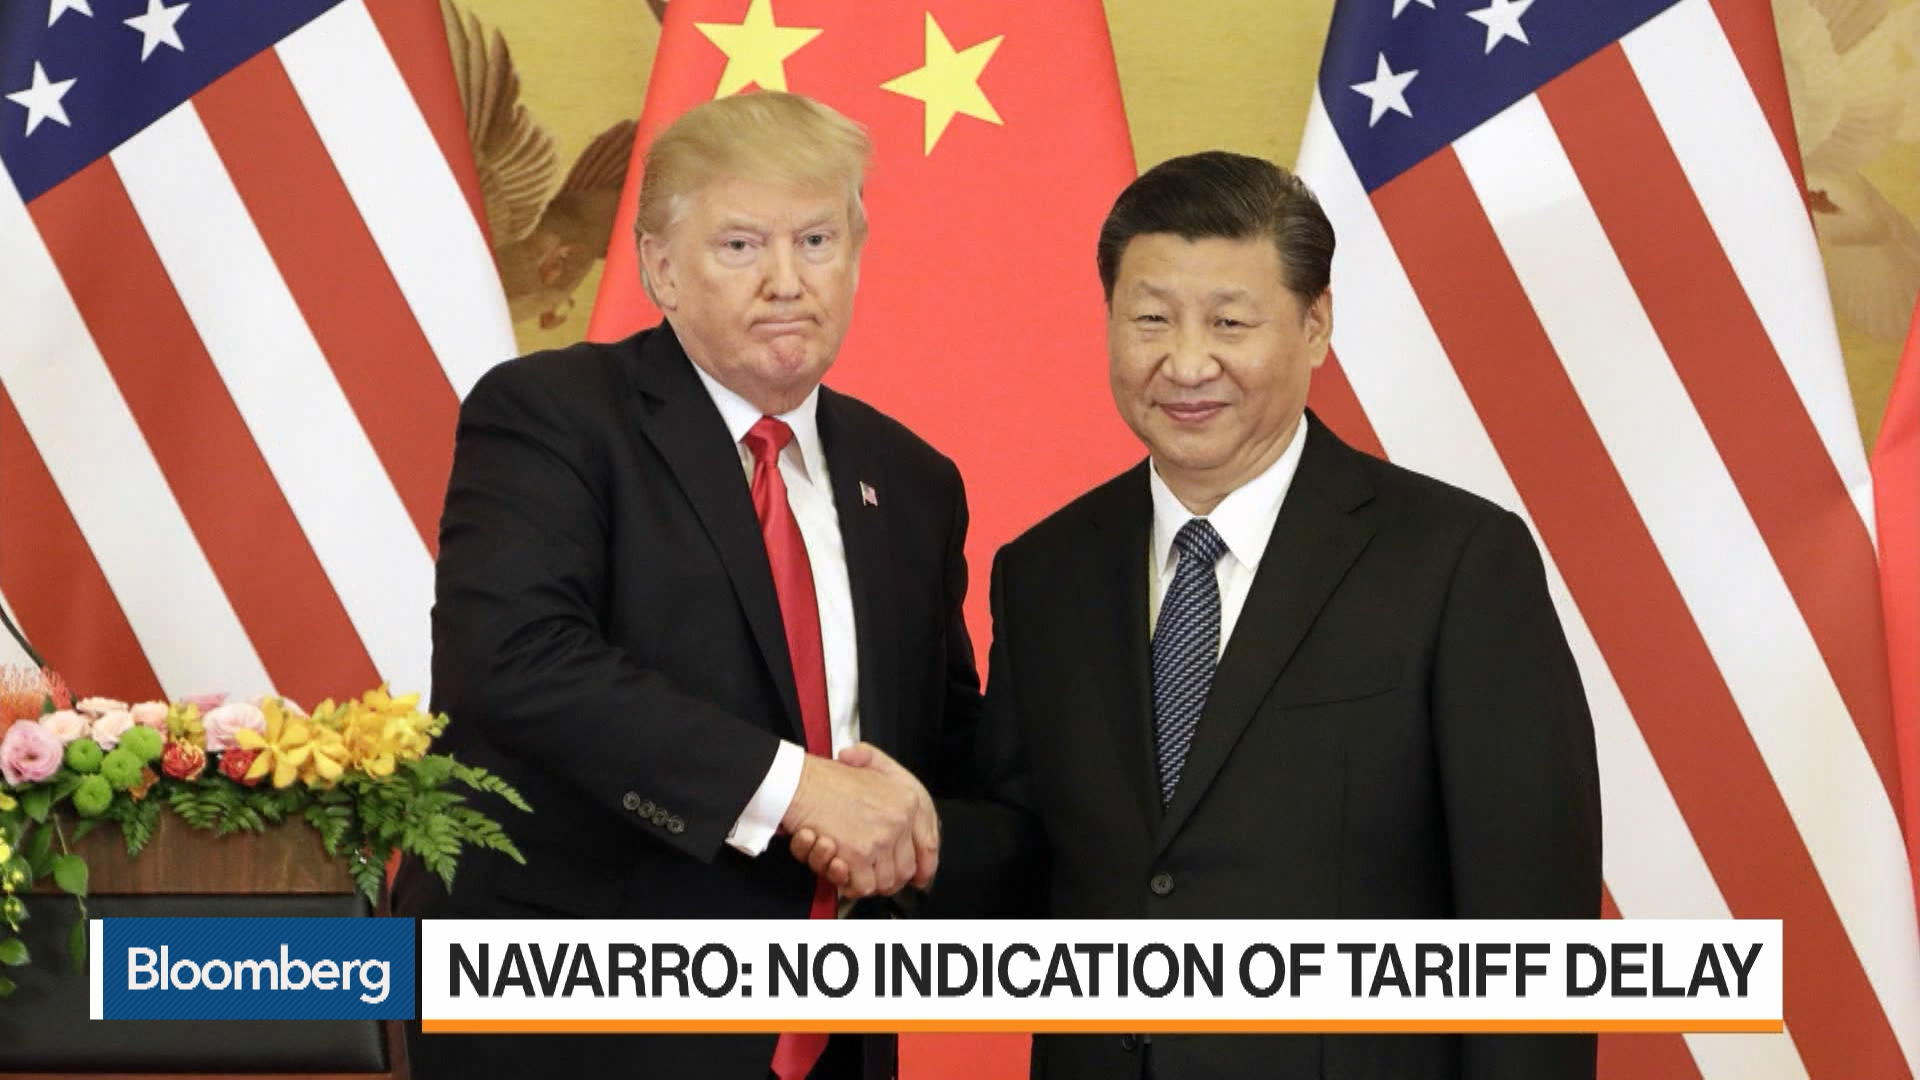 China Sees U.S. Delaying Dec. 15 Tariff Hike